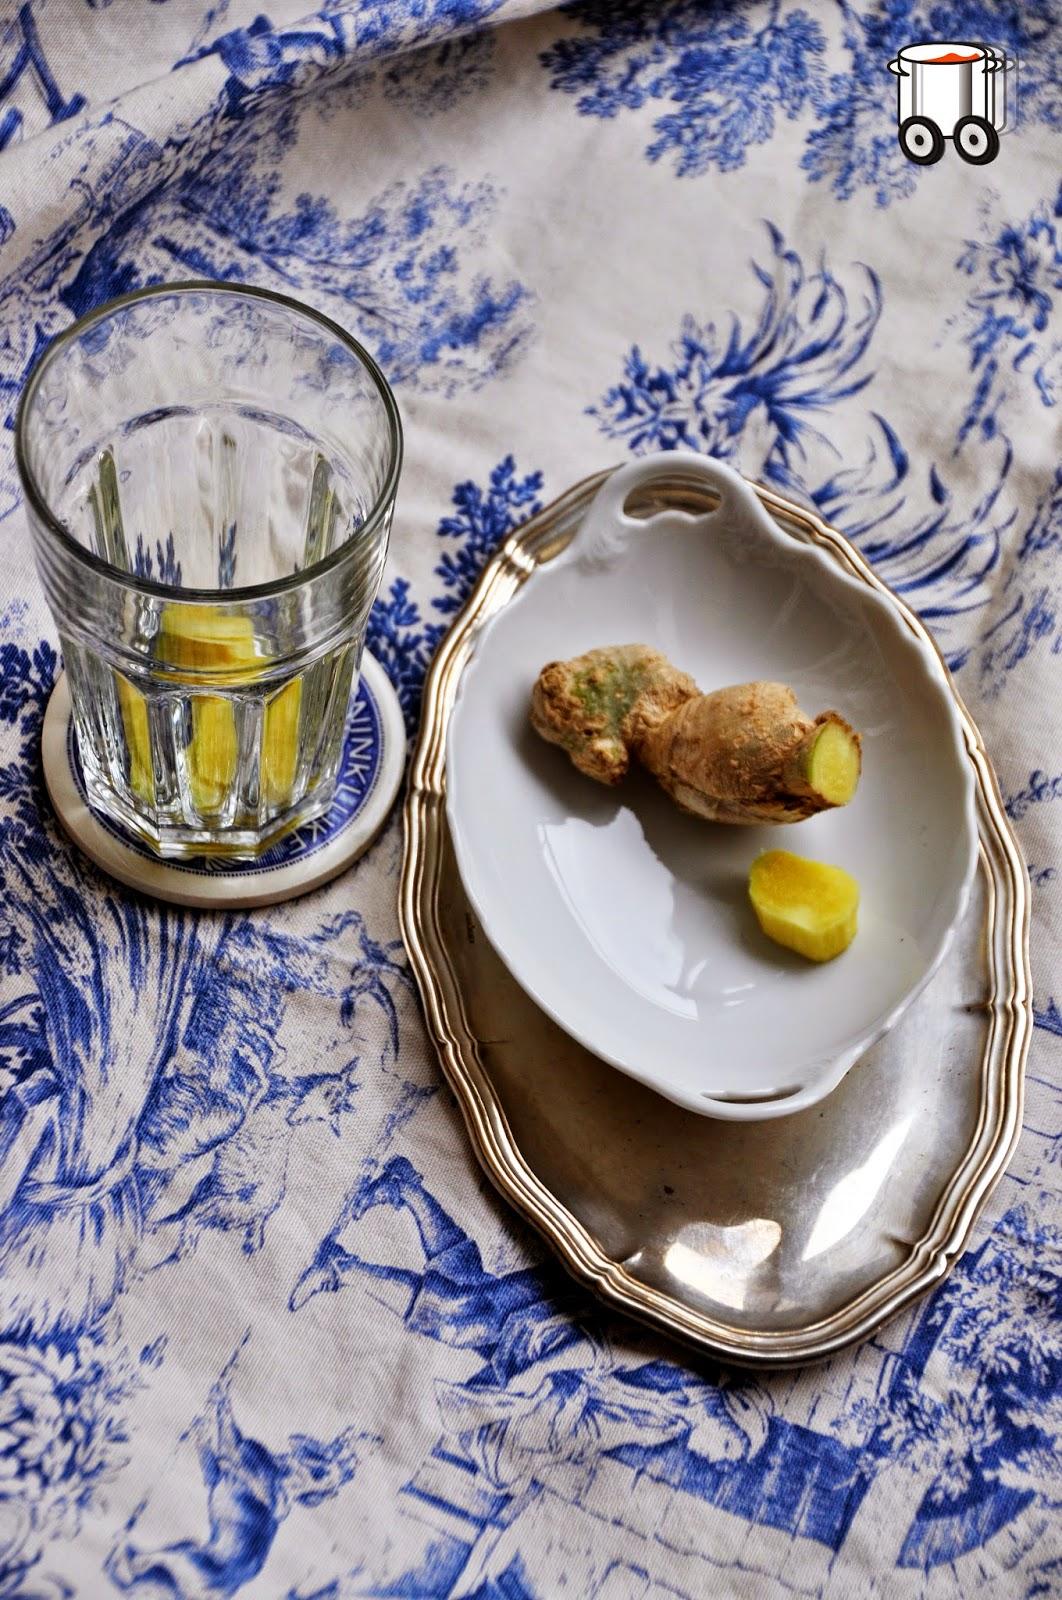 Szybko Tanio Smacznie - Domowa herbata imbirowa